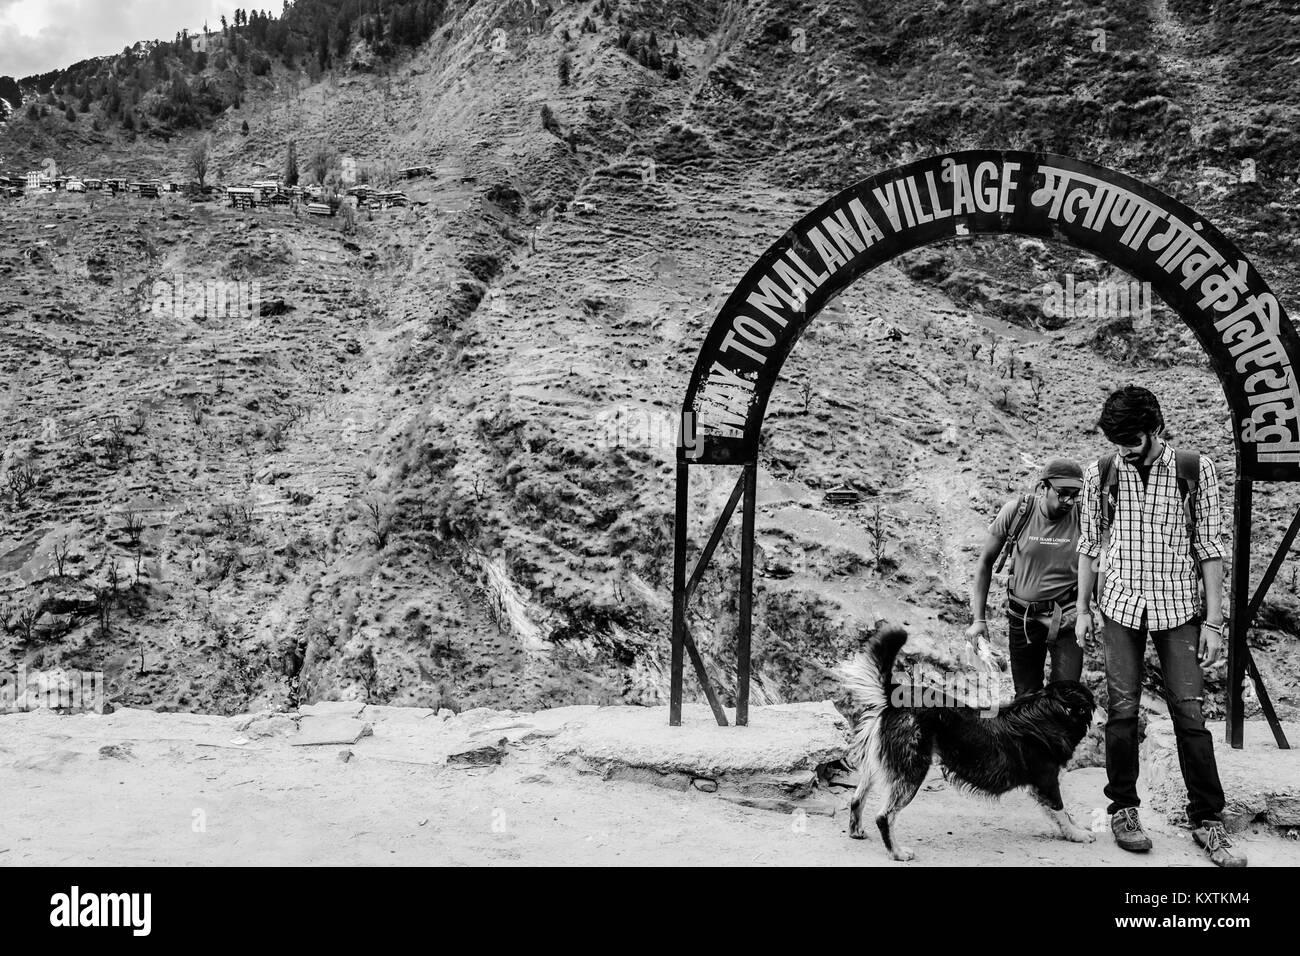 Malana Village - Himachal Pradesh - India © Sauriêl Ltd | Samantha Scholl | fb.com/SaurielPhotography - Stock Image